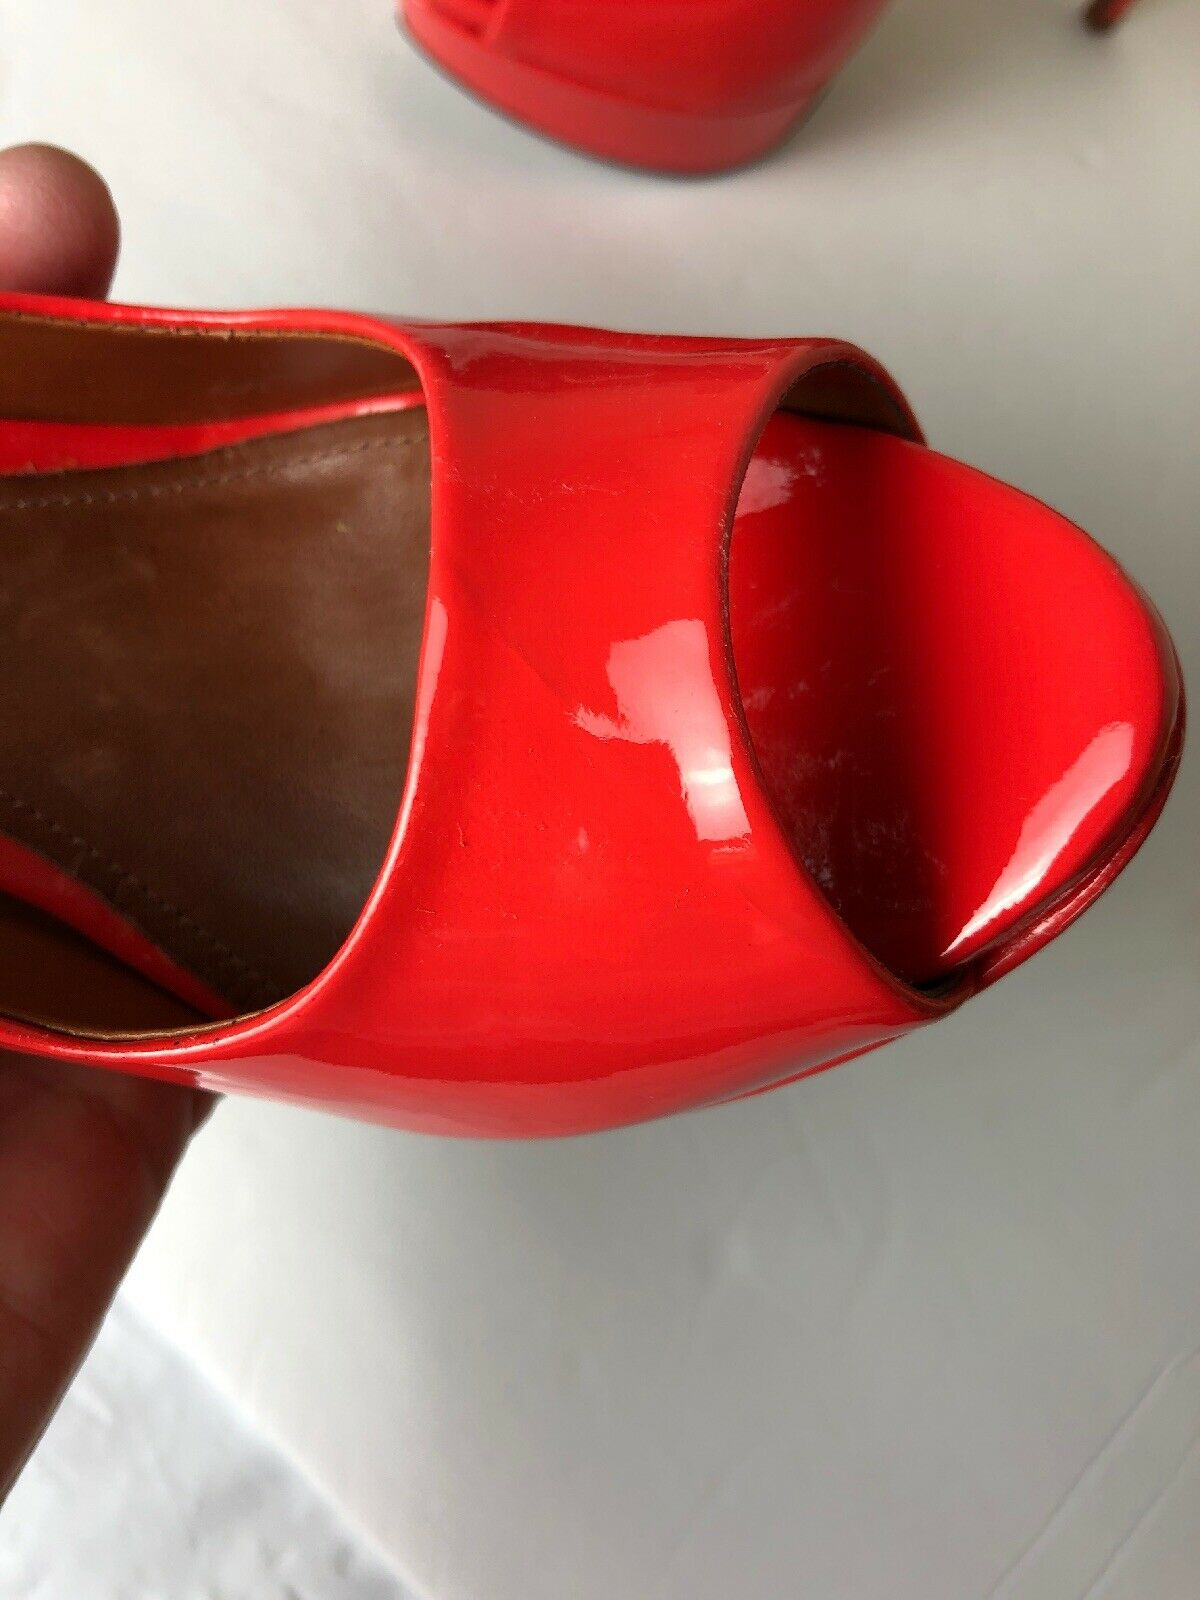 Schutz    Ingrid  Burnt orange Pumps shoes Heels Size 9 B Heels - GORGEOUS d2dcc1